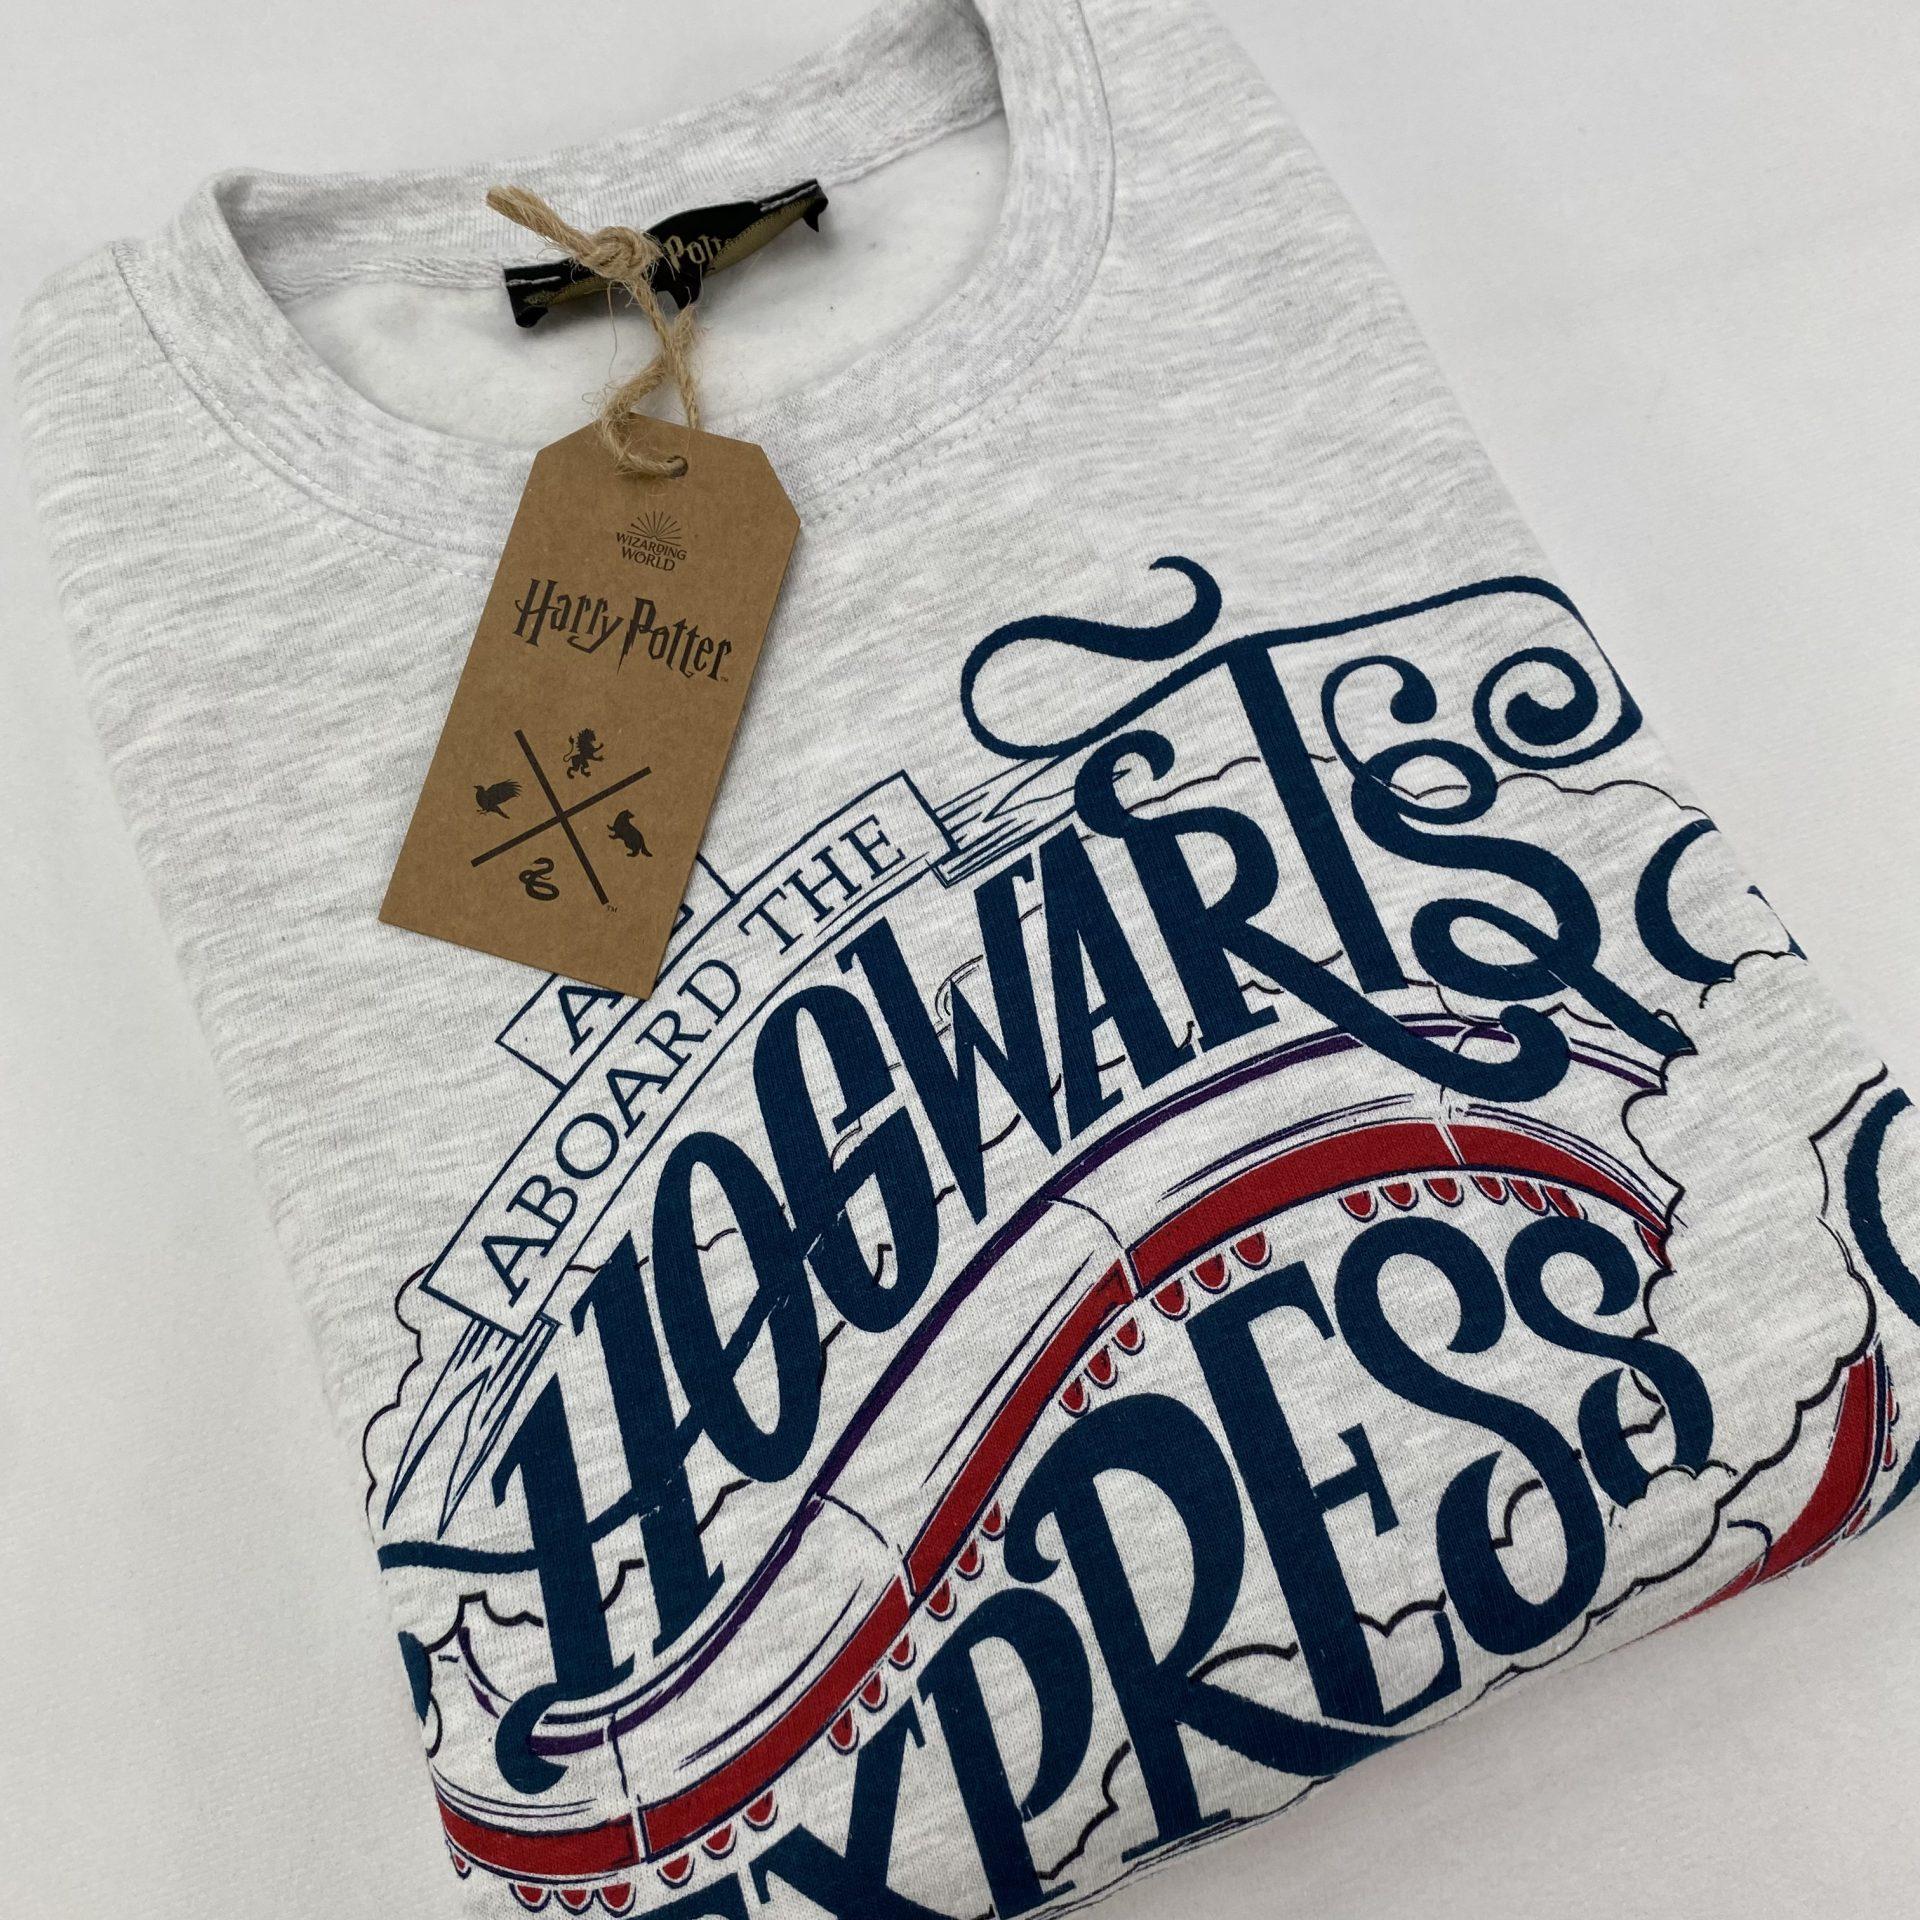 Hogwarts printed sweatshirt